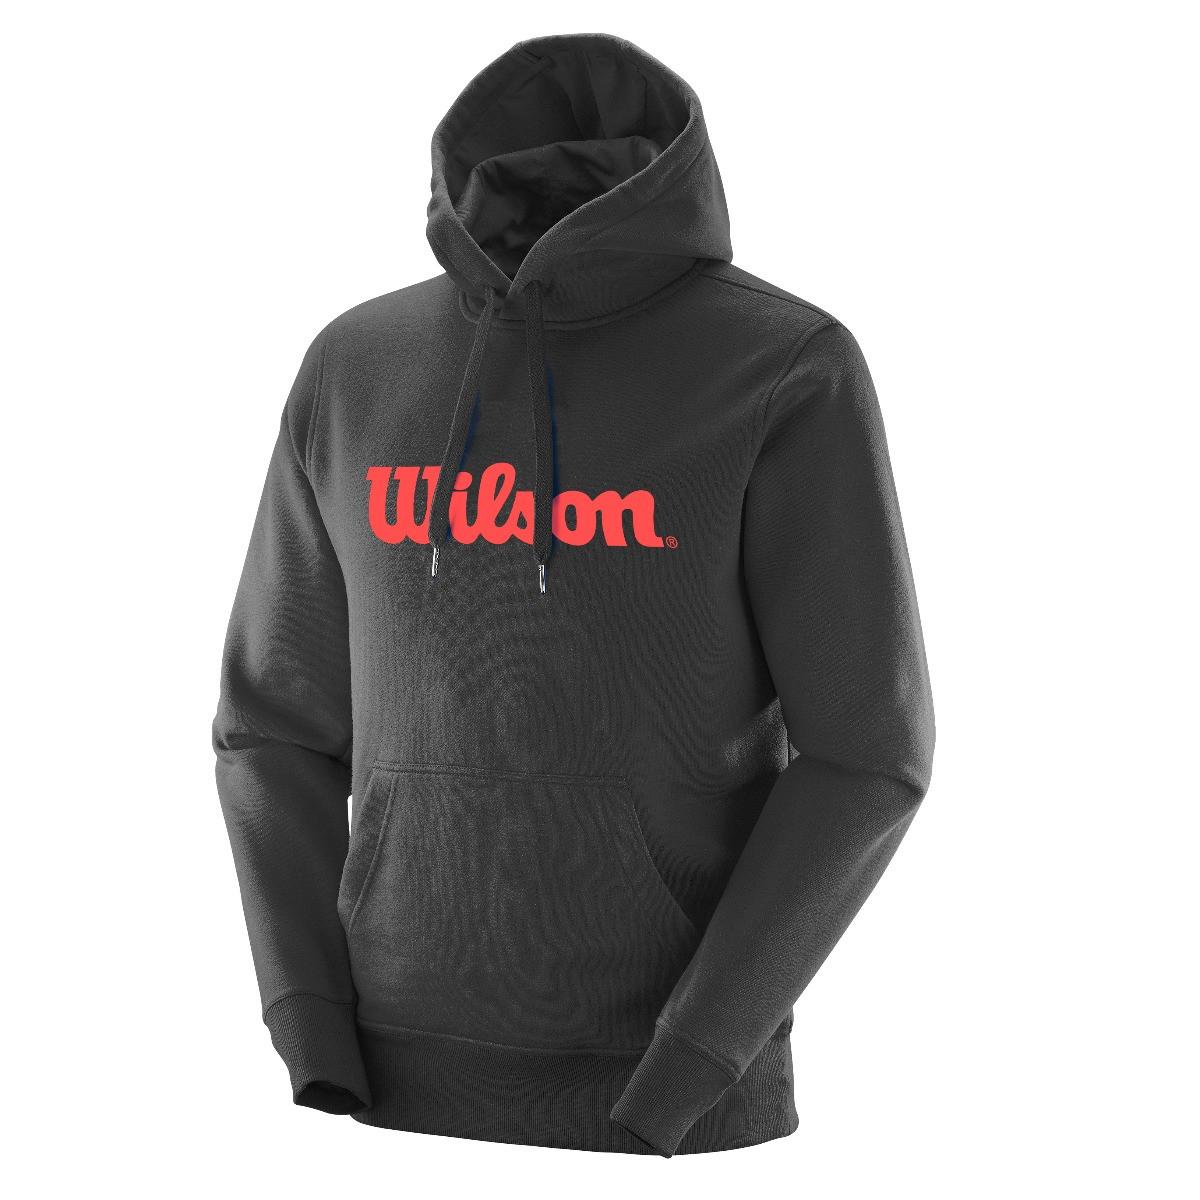 Blusa Wilson Graphic Hoodie II Preto e Vermelho